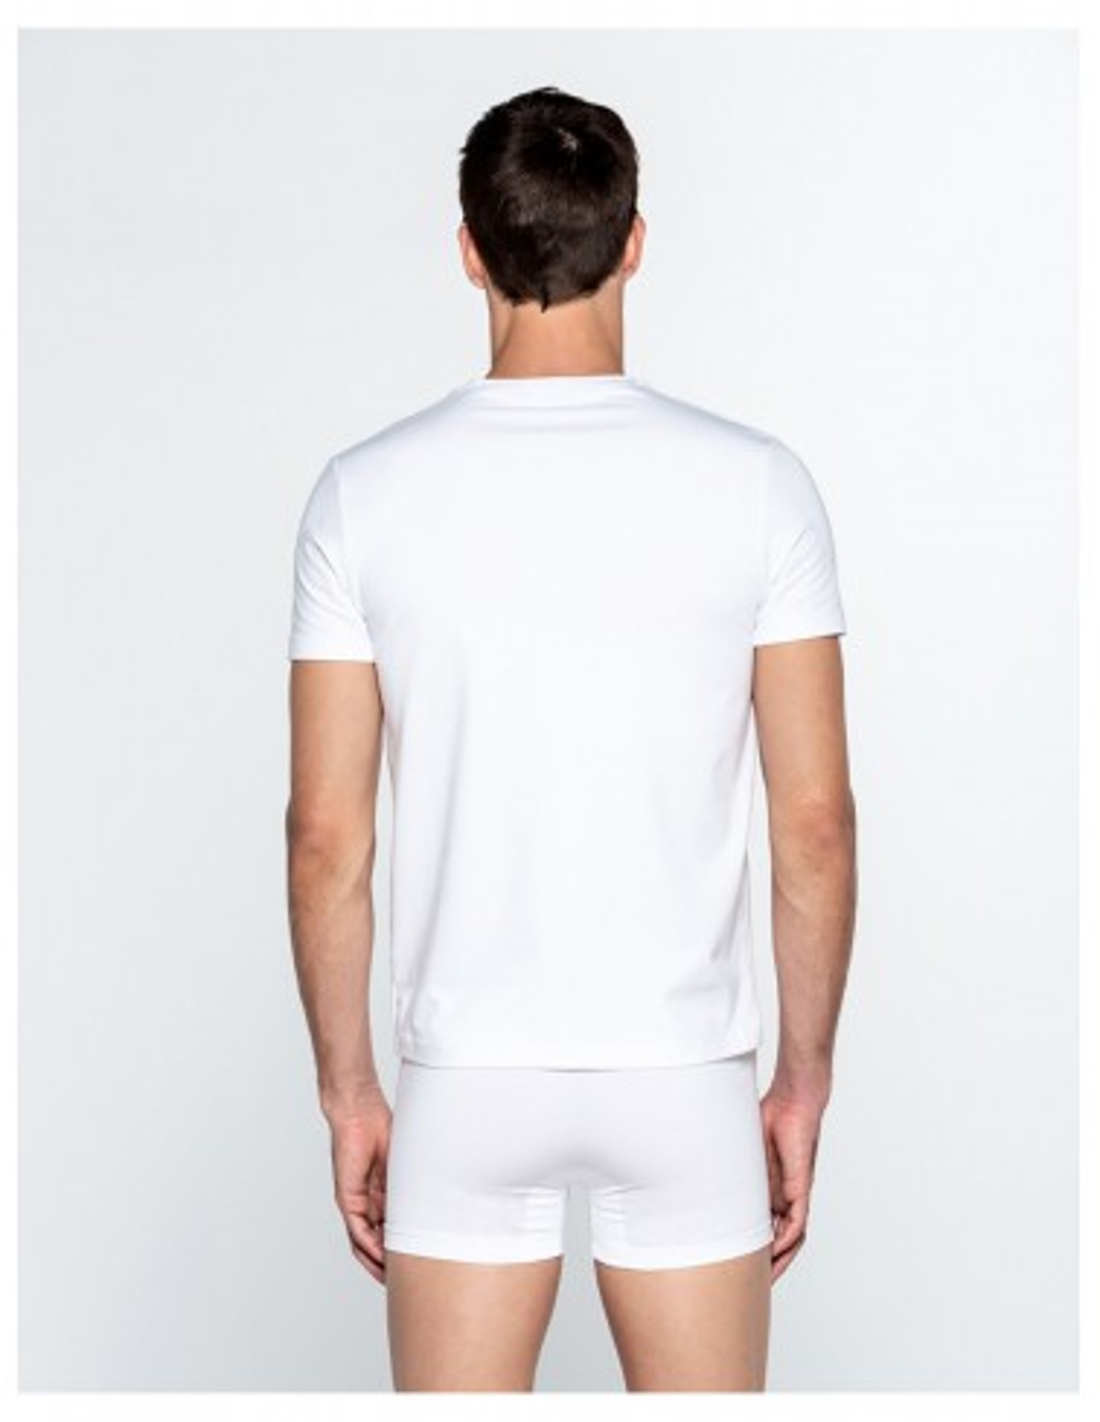 Camiseta Punto Blanco cuello redondo Ecologix TALLAS: s, m, l, xl; COLOR: blanco, negro Composición: algodón - HOMBRE